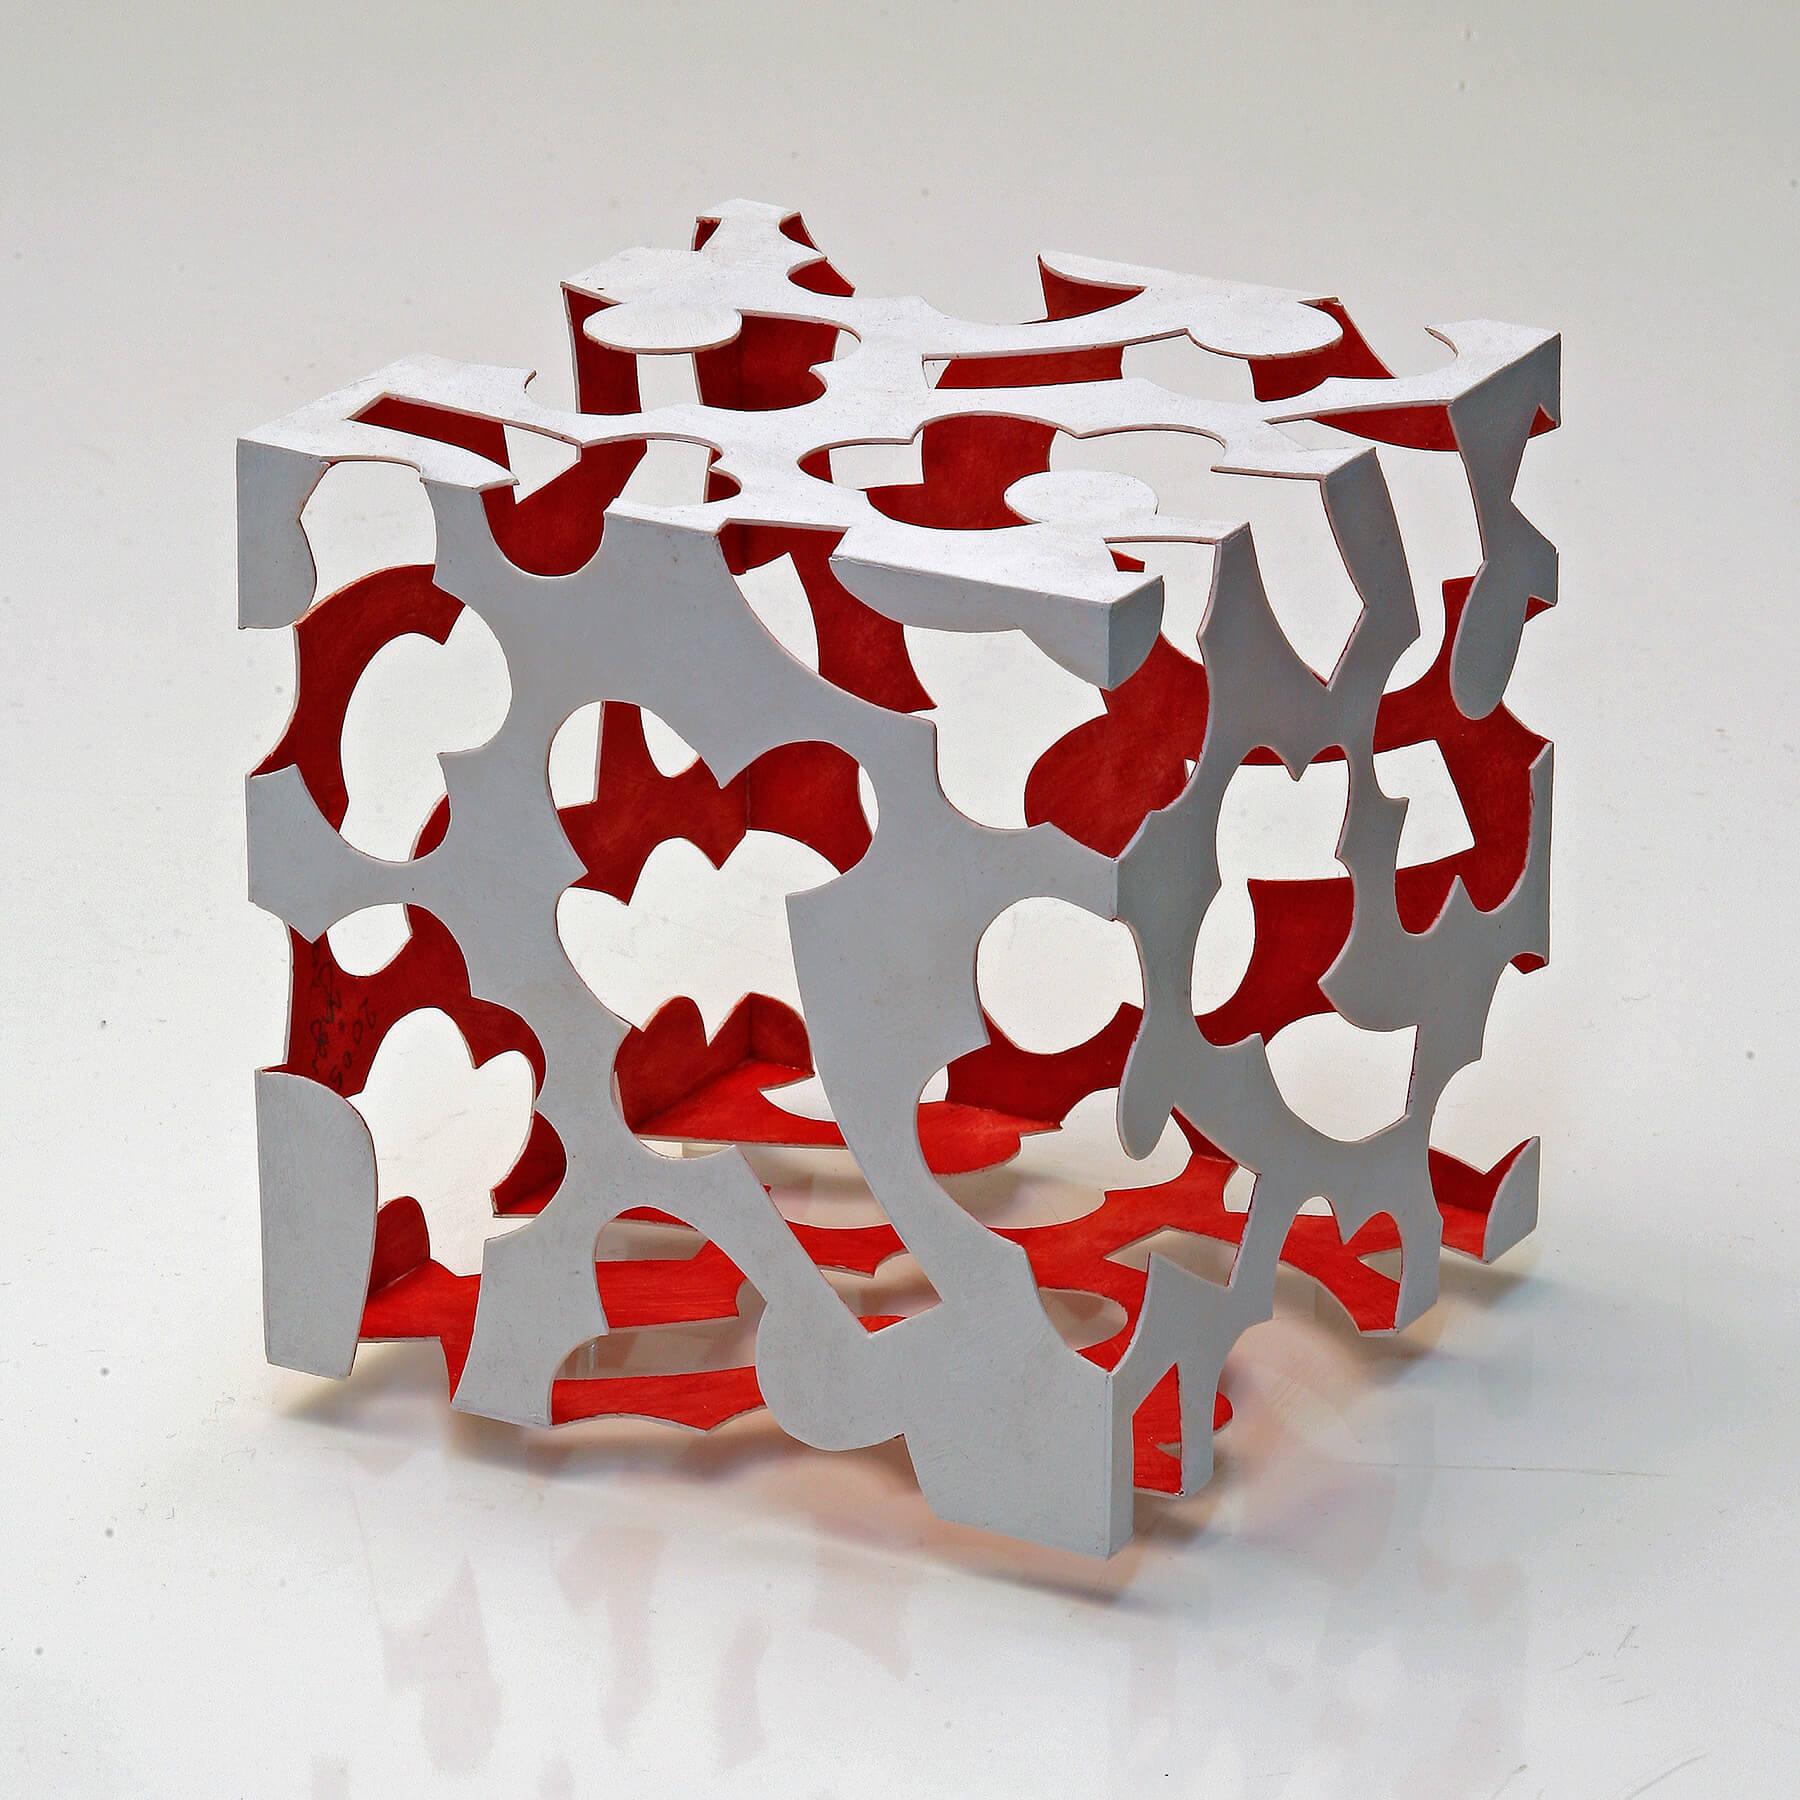 Barbara Jäger Skulpturen Kleiner roter Innenraum Kunststoff Acryl